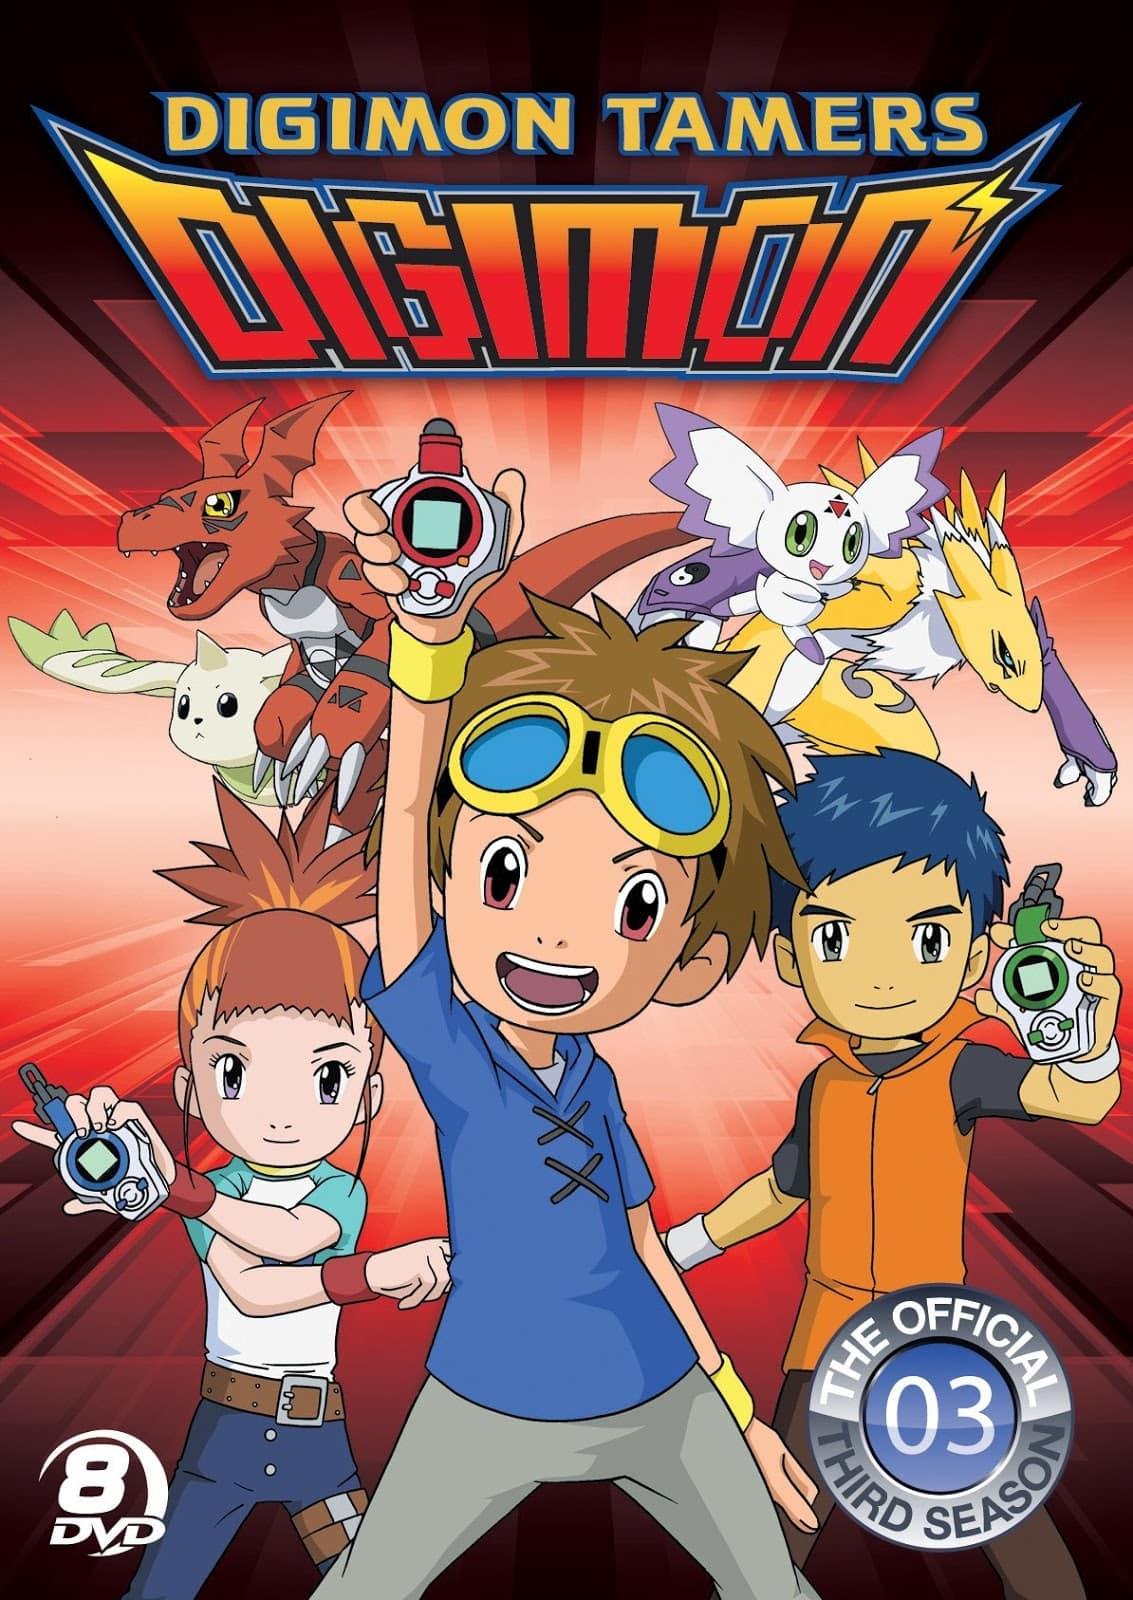 >Digimon Tamers ดิจิมอนเทมเมอร์ส ตอนที่ 1-51 พากย์ไทย